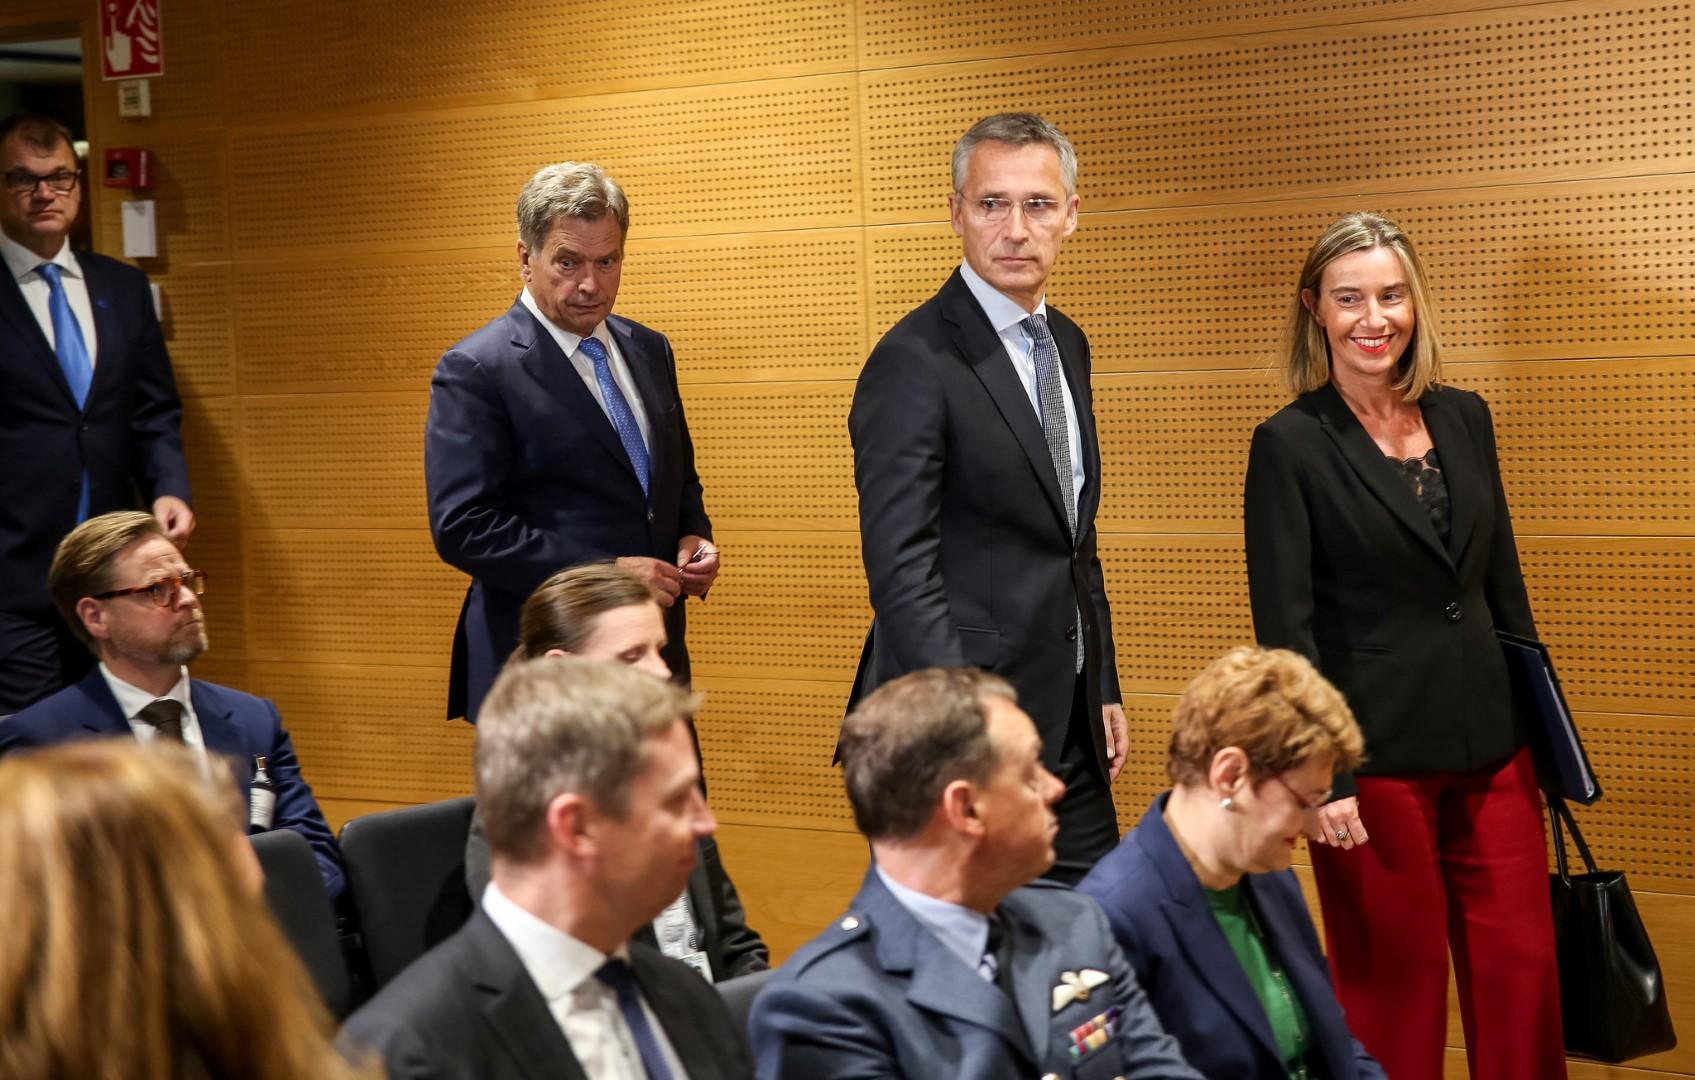 President Niinistö Compares Hybrid Threats To an Old Story About a Man With a Sandbag